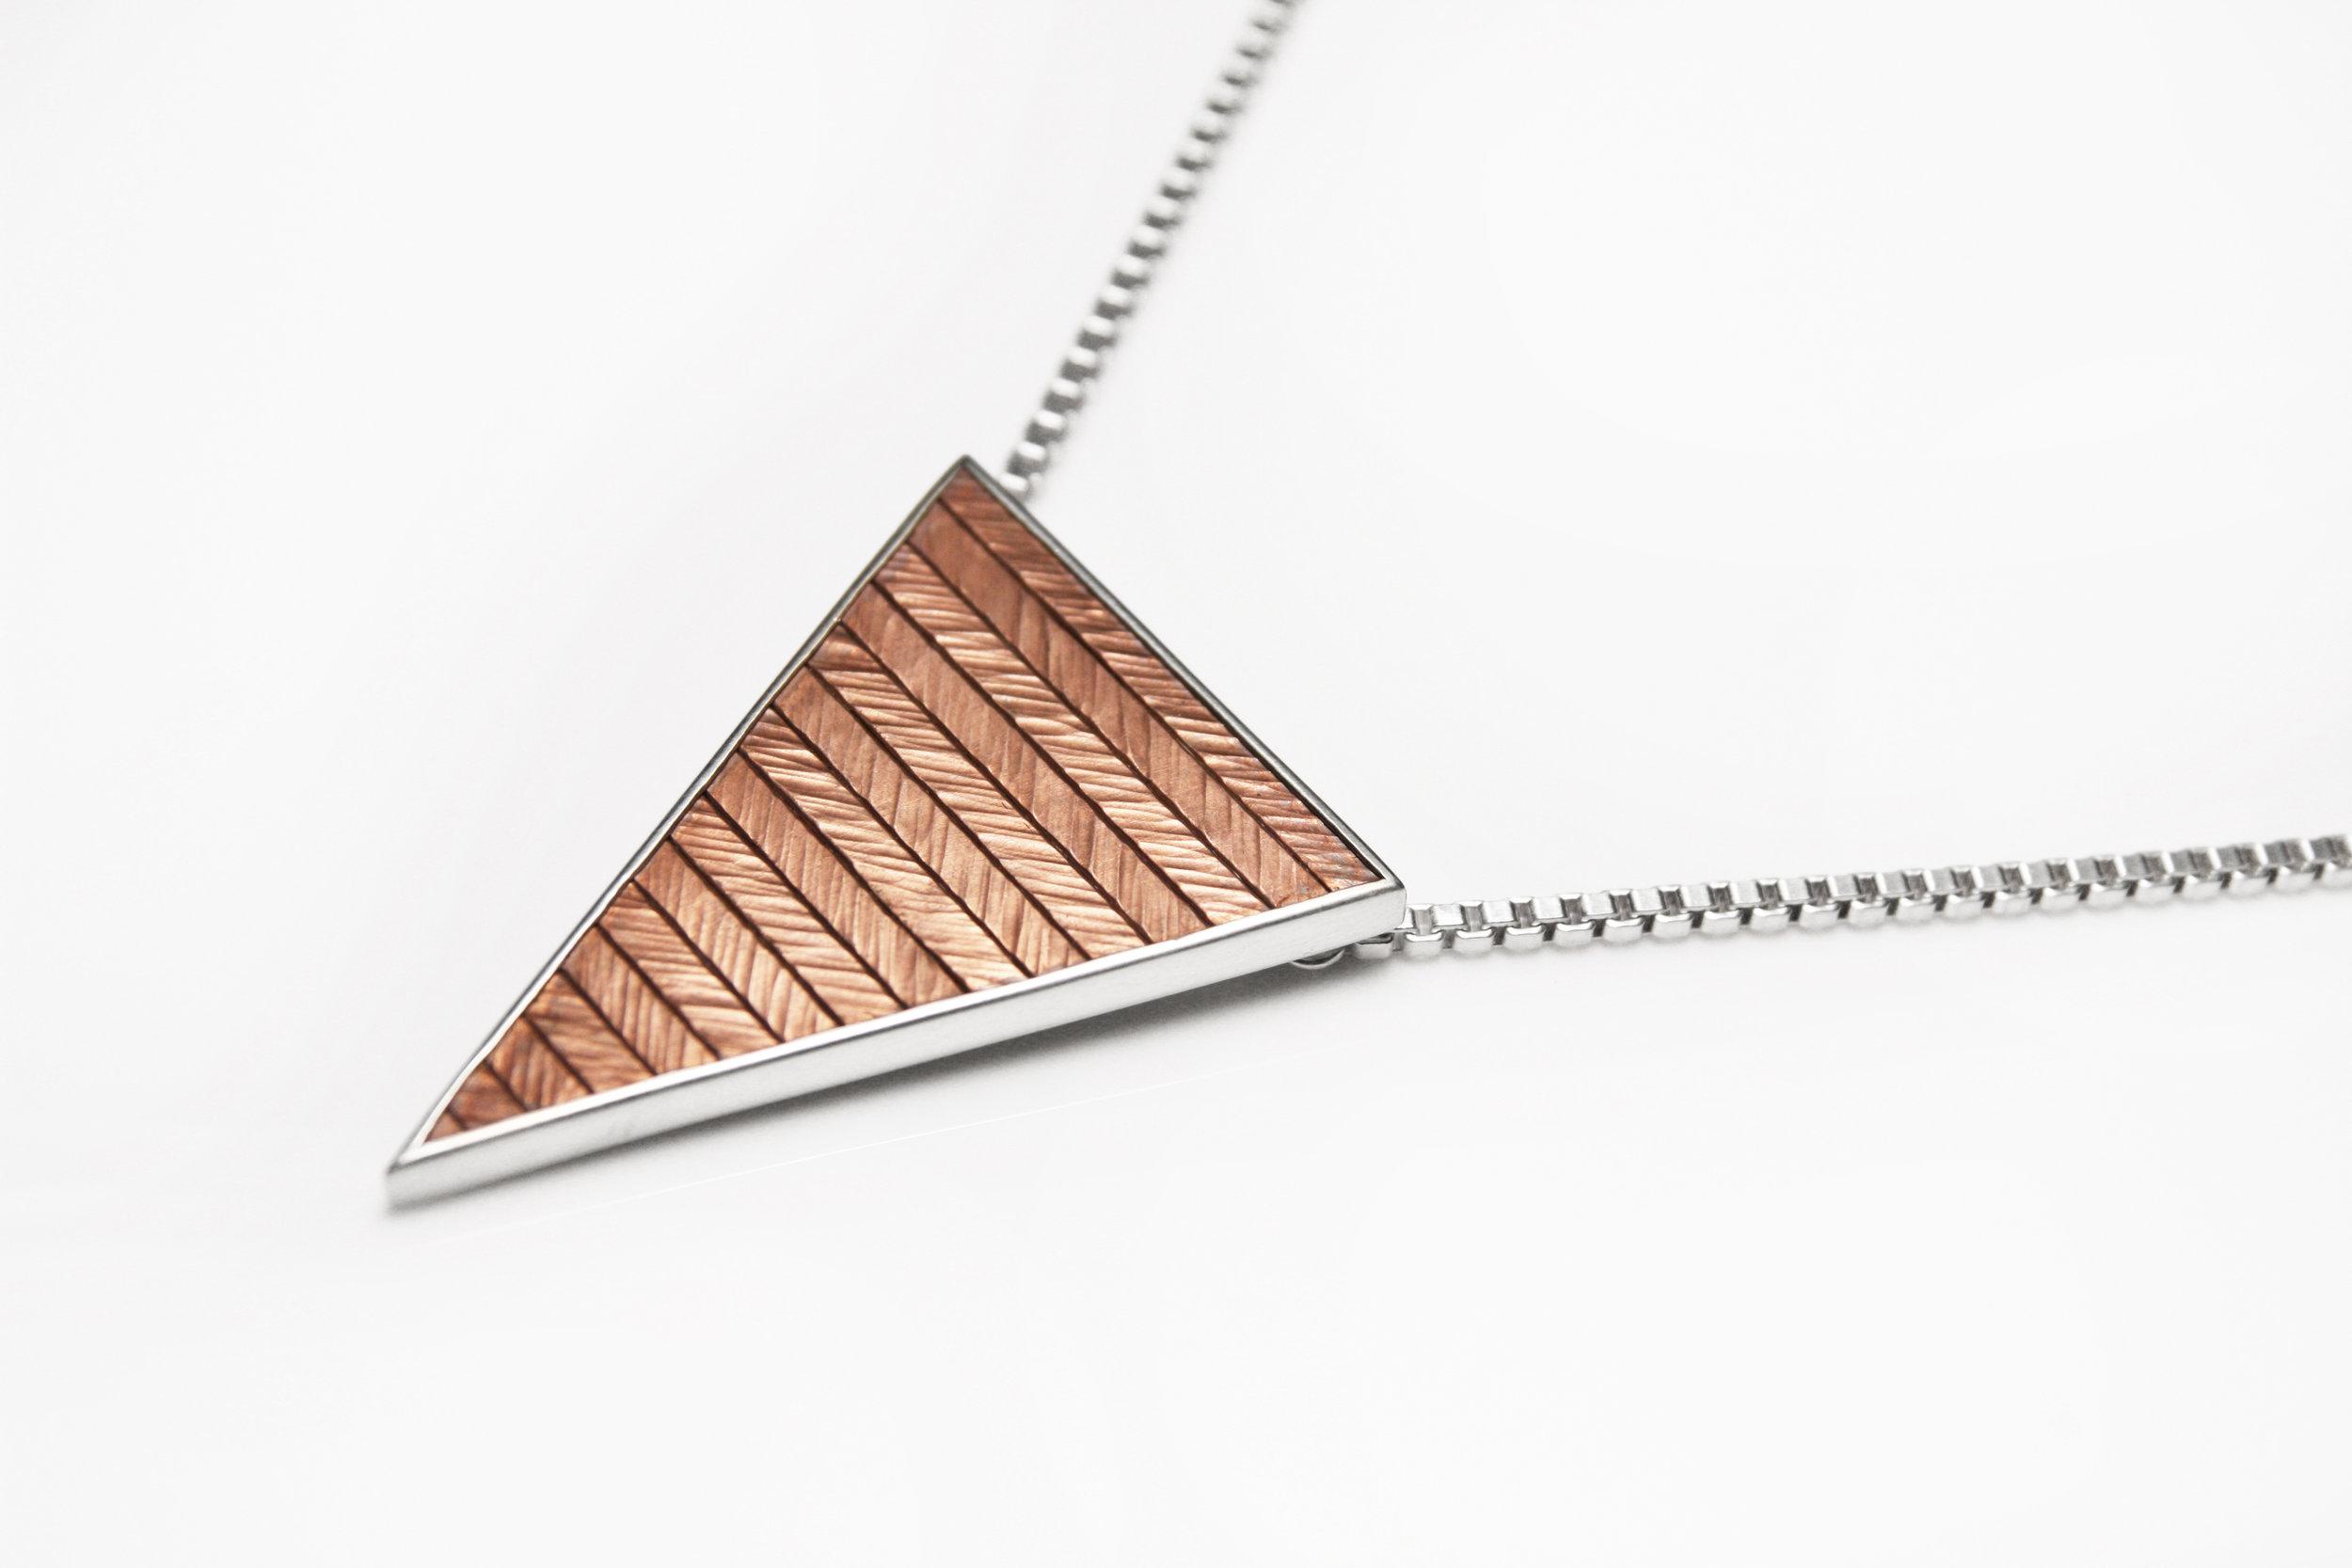 herringbone_triangle_medium_1_light.jpg